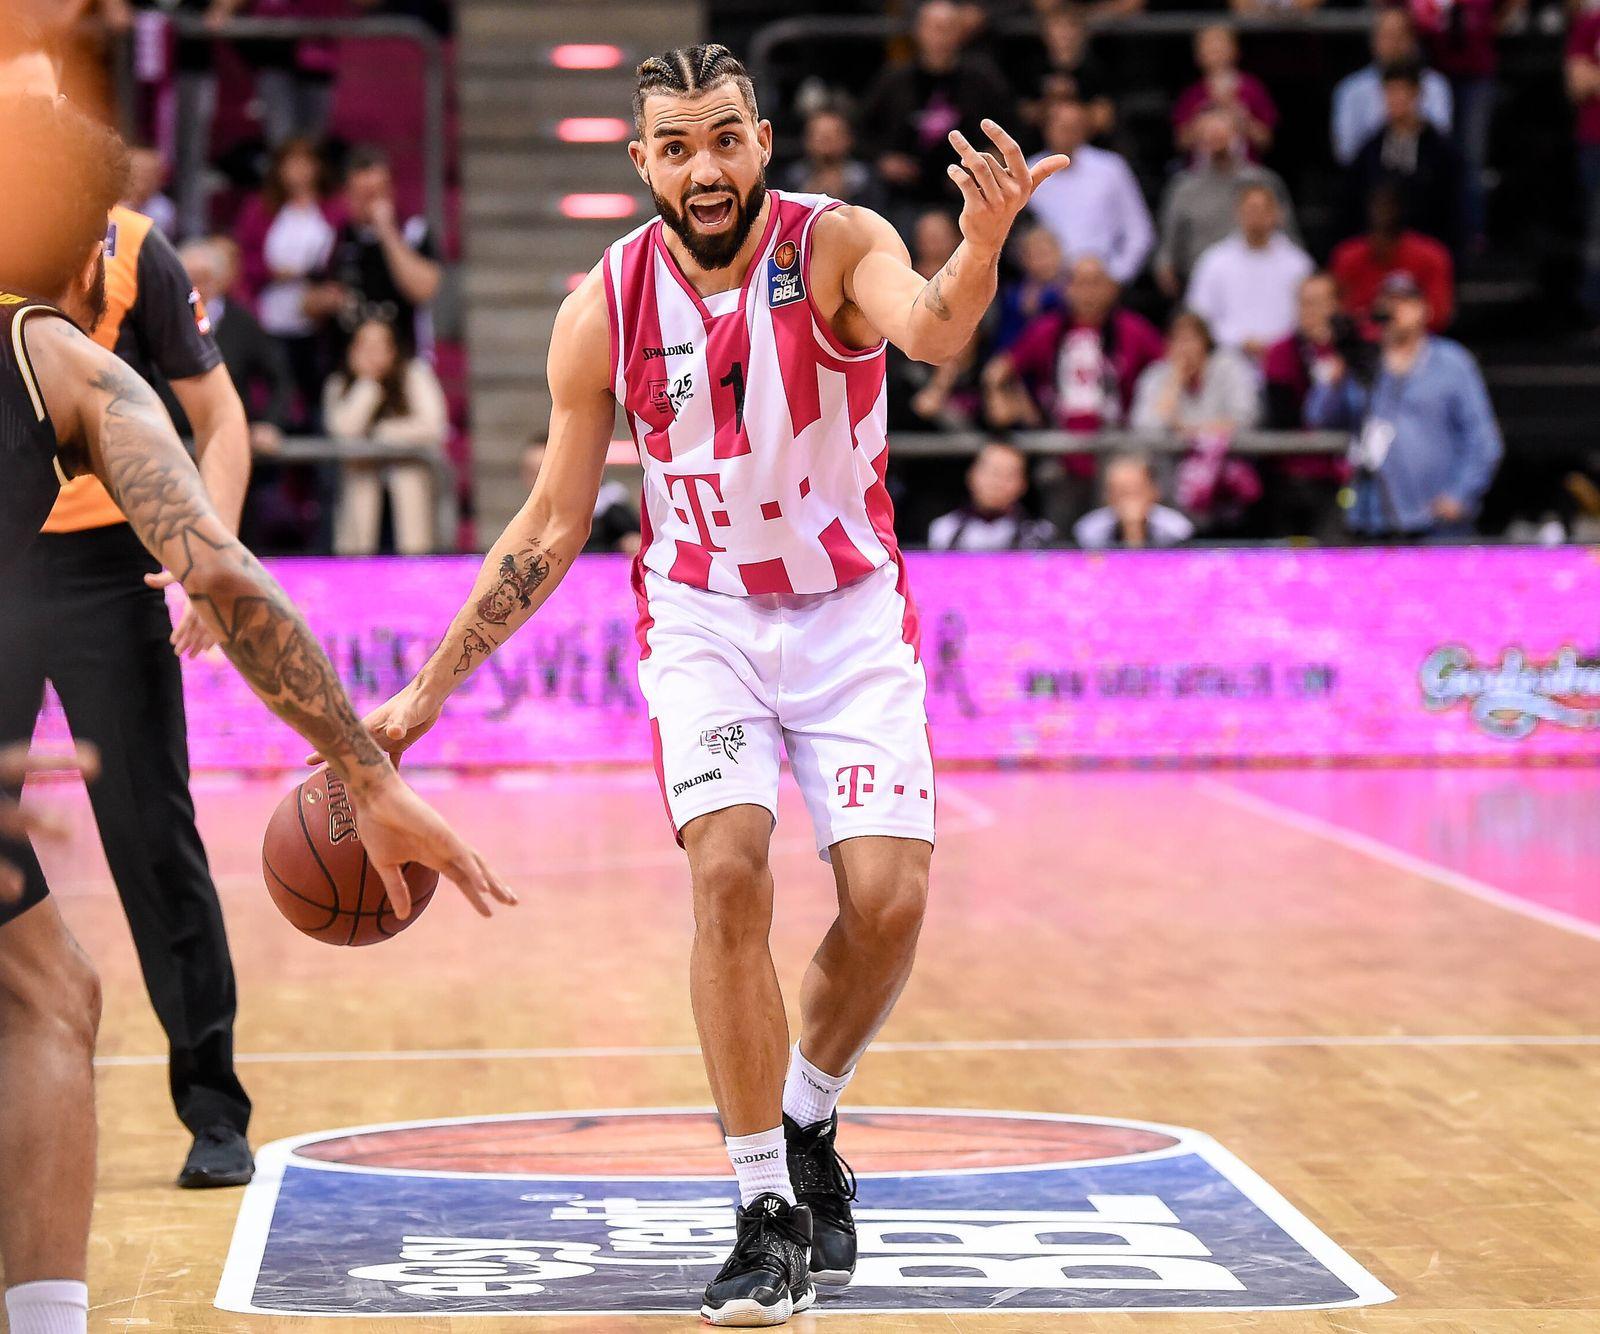 Sport Bilder des Tages easyCredit BBL, Telekom Baskets Bonn vs. MHP RIESEN Ludwigsburg, 12.02.2020 Joshiko Saibou (Telek